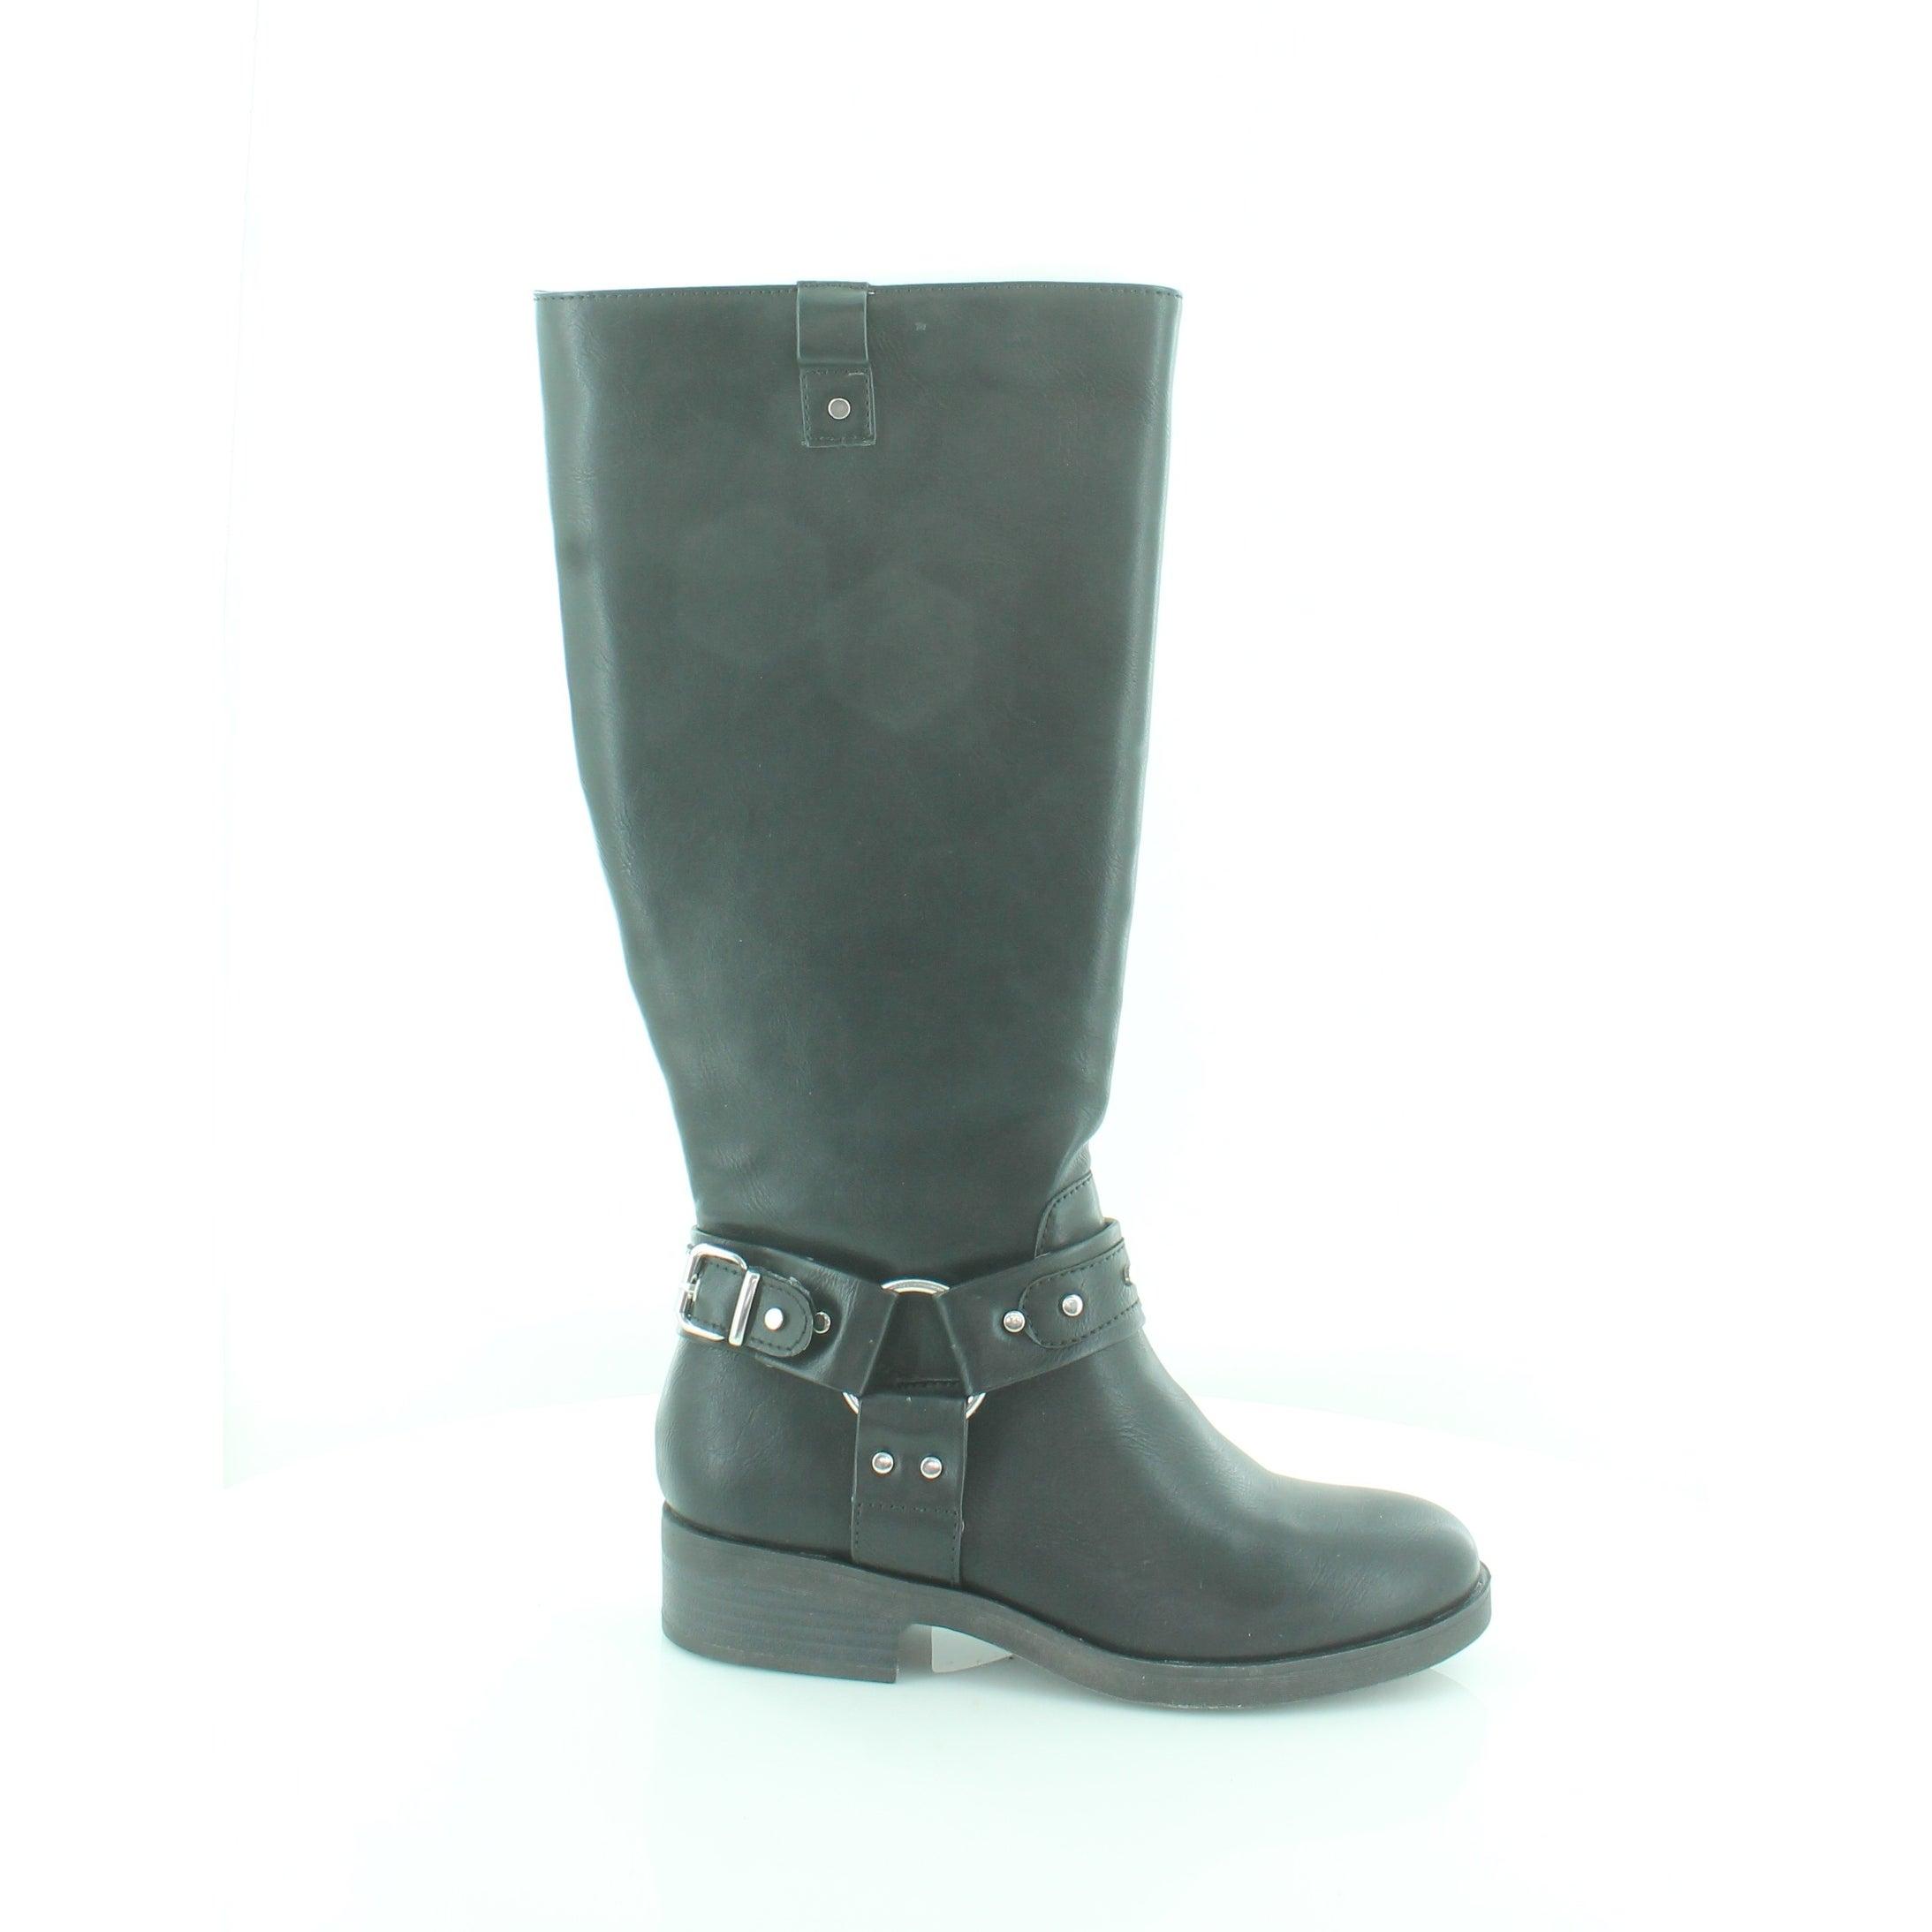 Shop Madden Girl Mckenzie Women's Boots